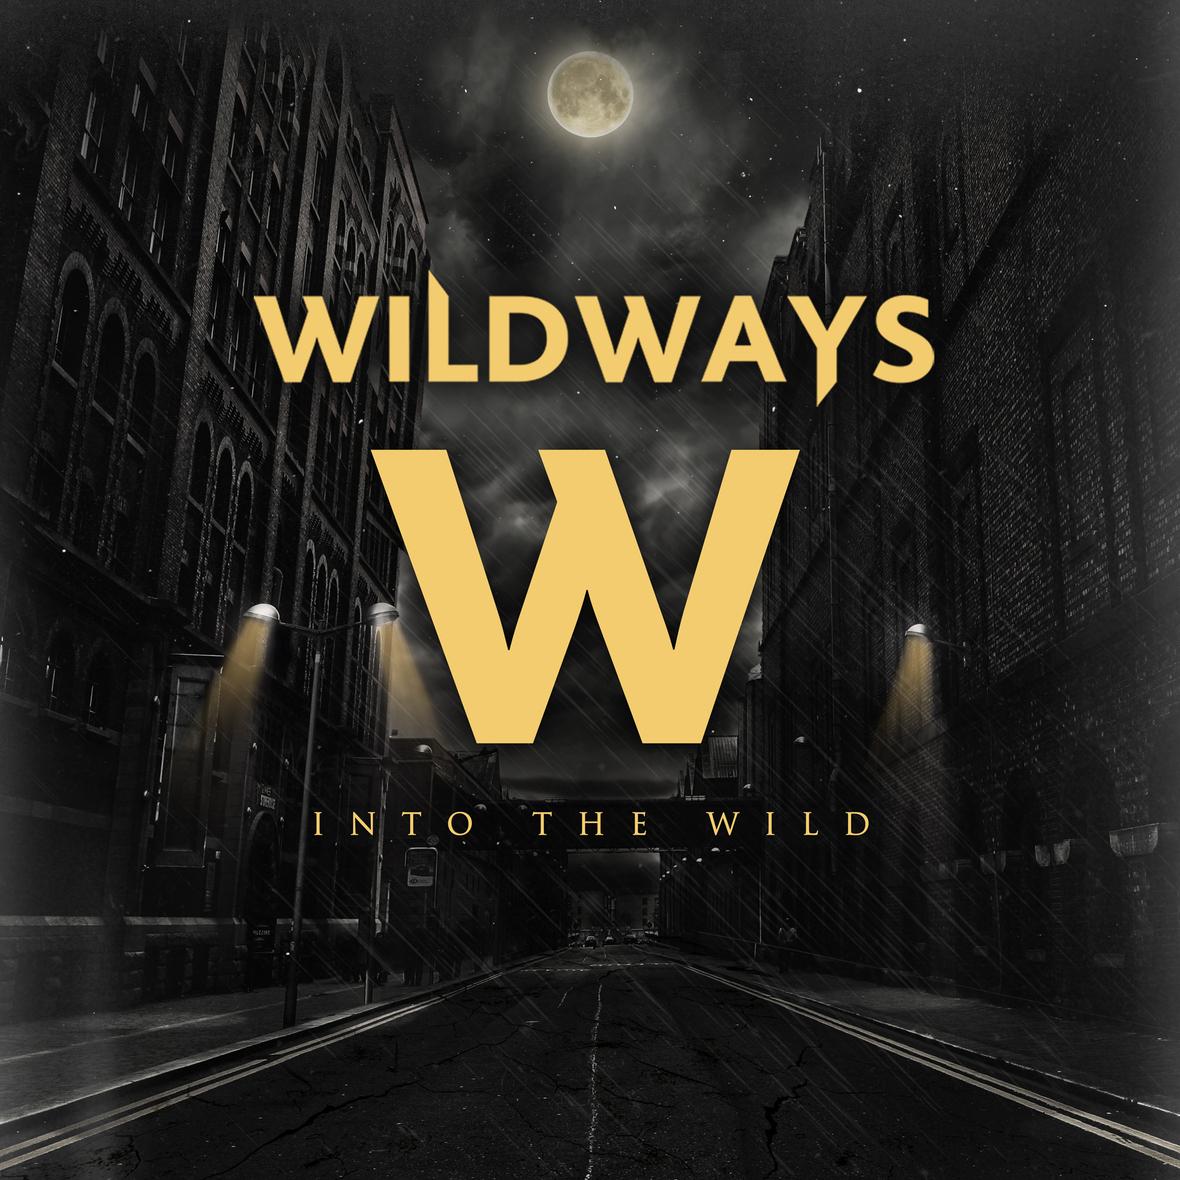 WILDWAYS 1